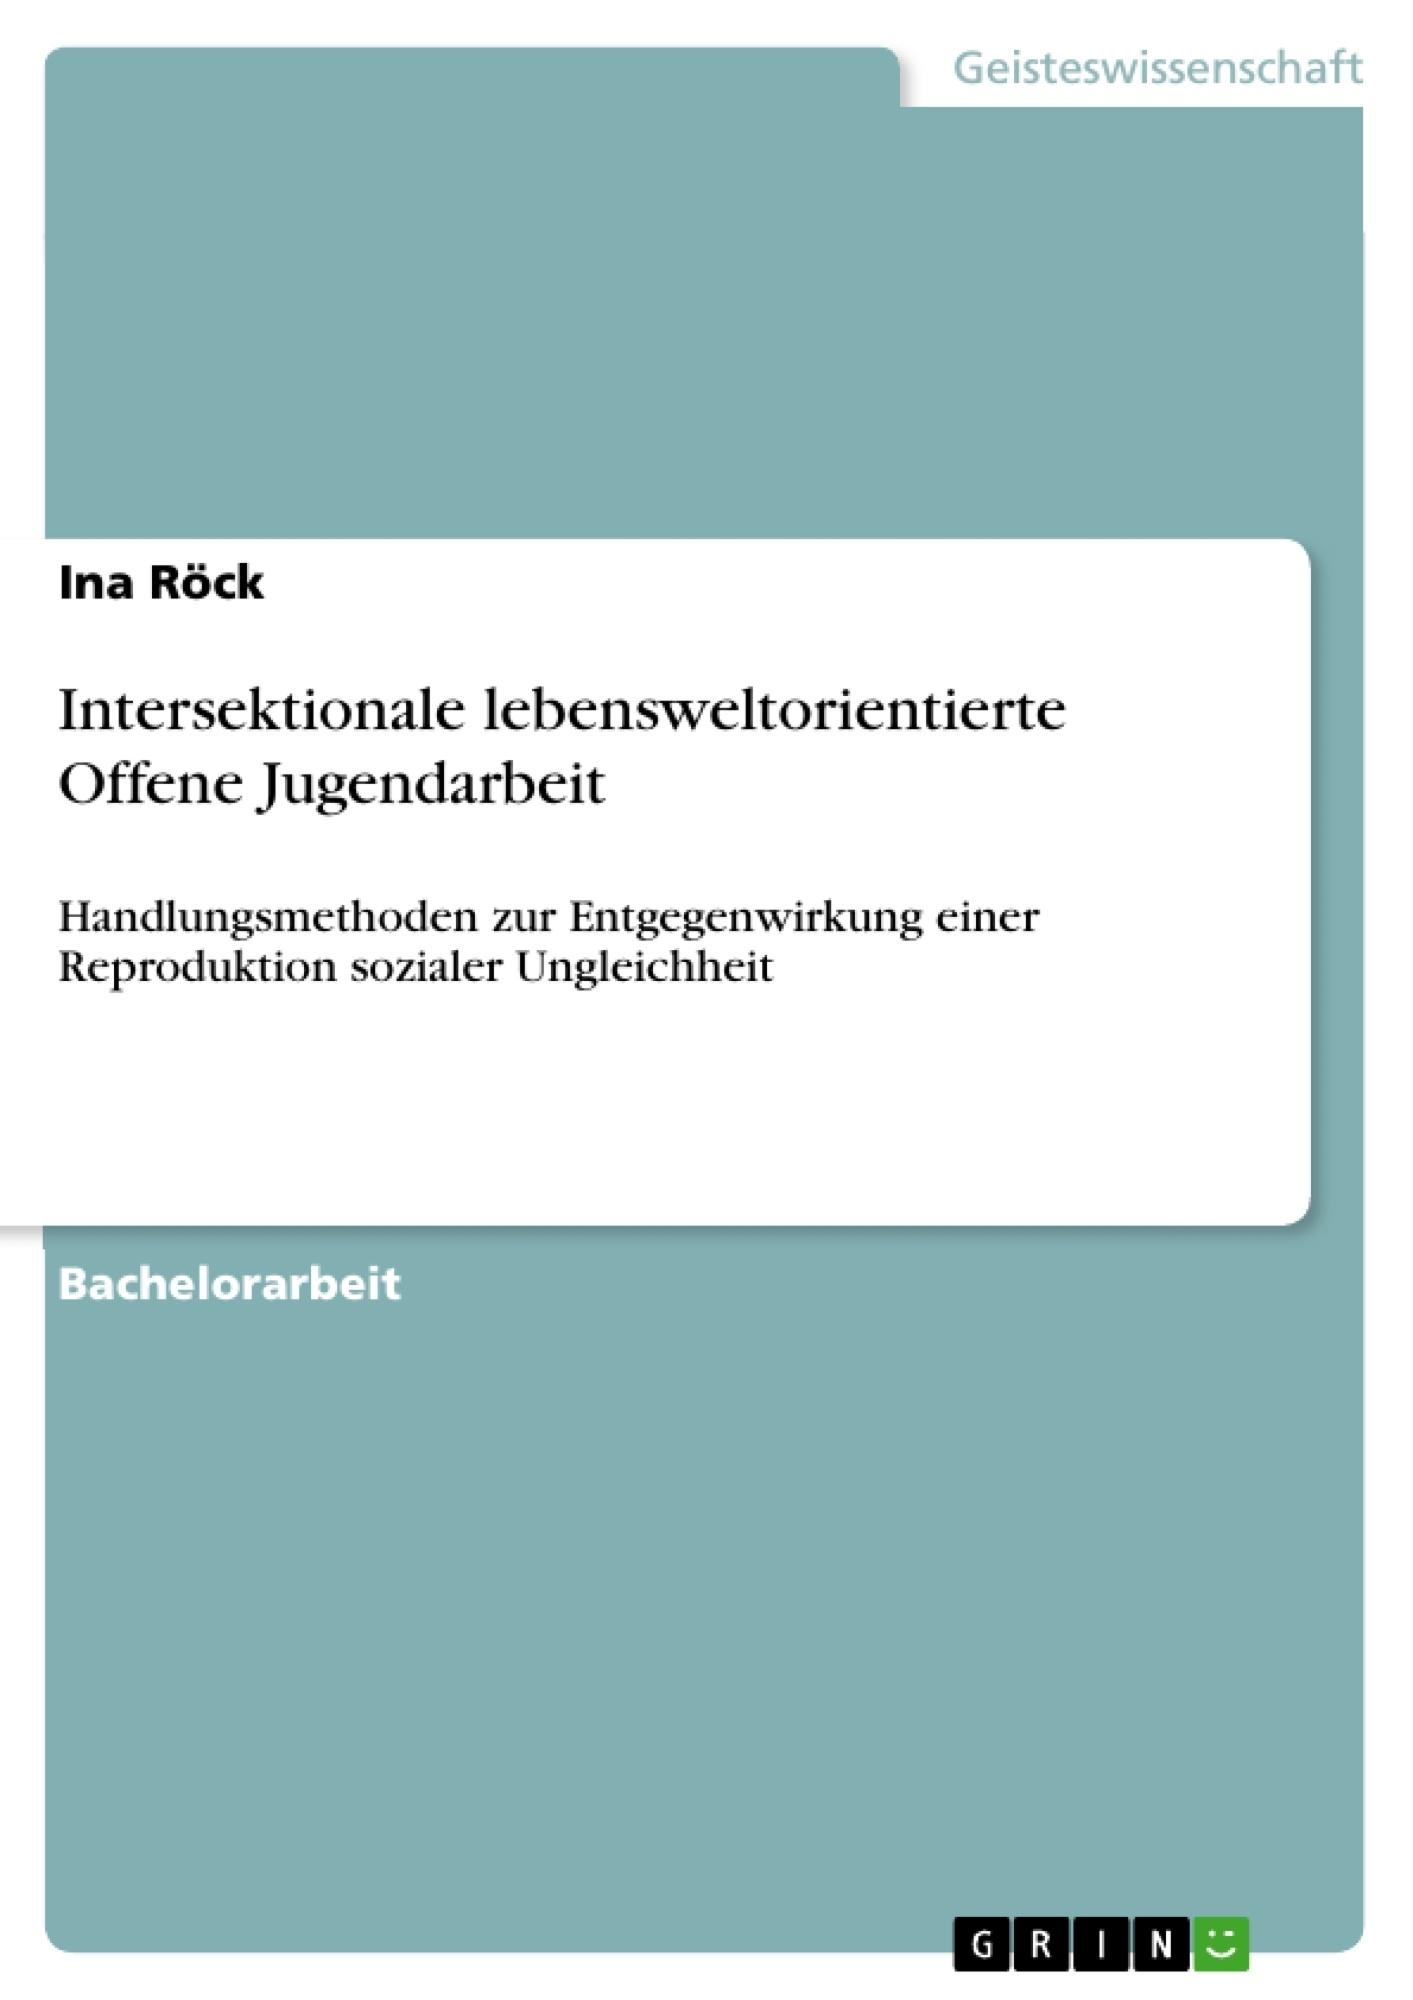 Titel: Intersektionale lebensweltorientierte Offene Jugendarbeit